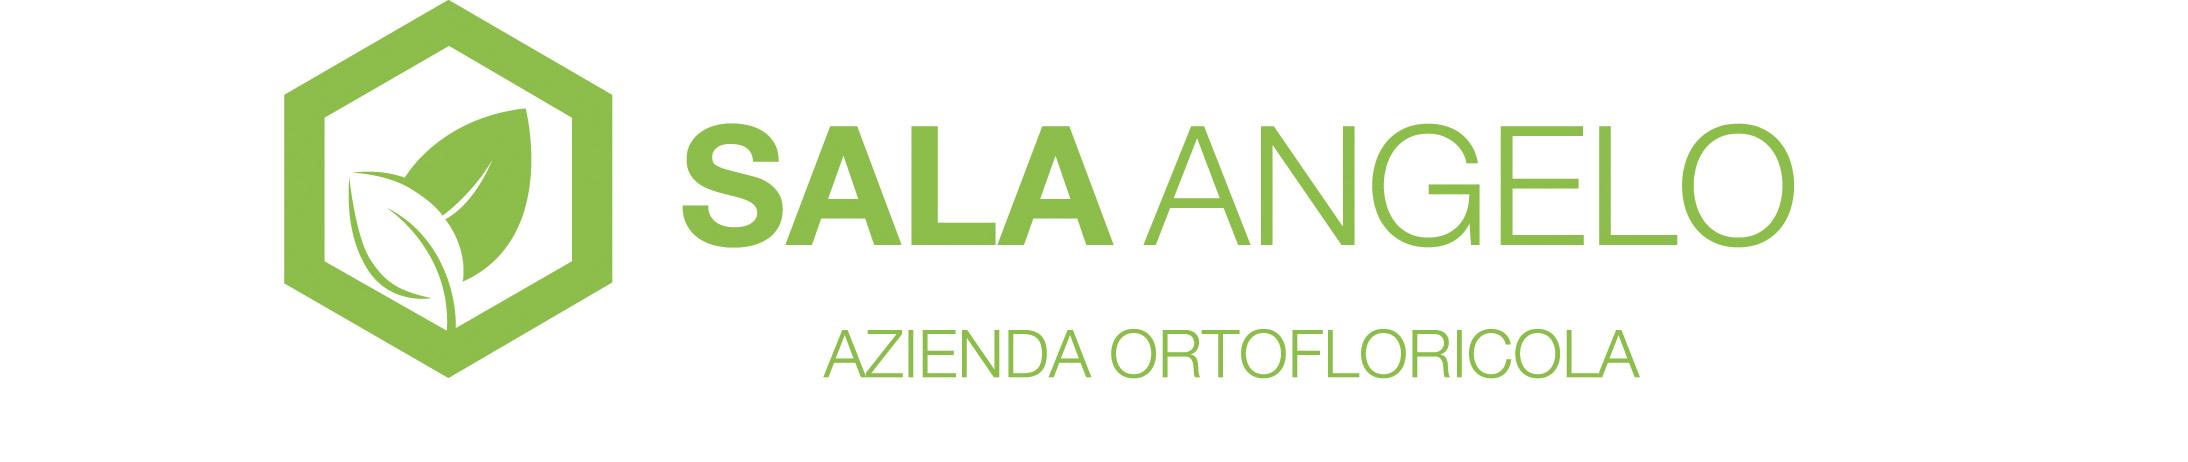 Azienda Ortofloricola Sala Angelo – Brescia